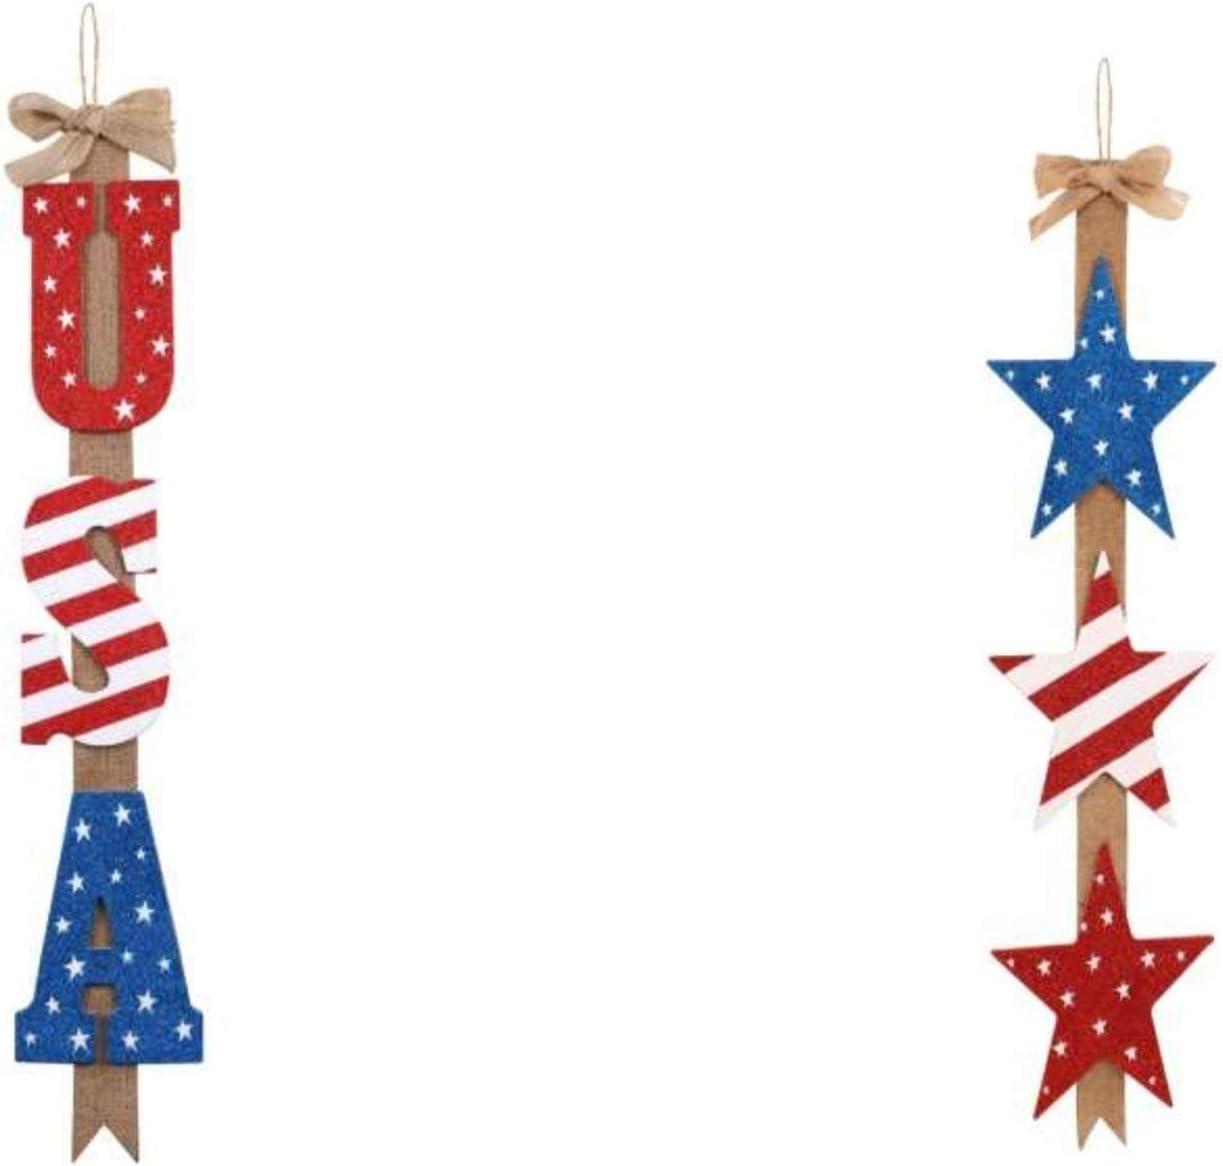 CGT Oakland Mall Patriotic Finally popular brand Hanging Glitter USA Signs Star Burlap Wall